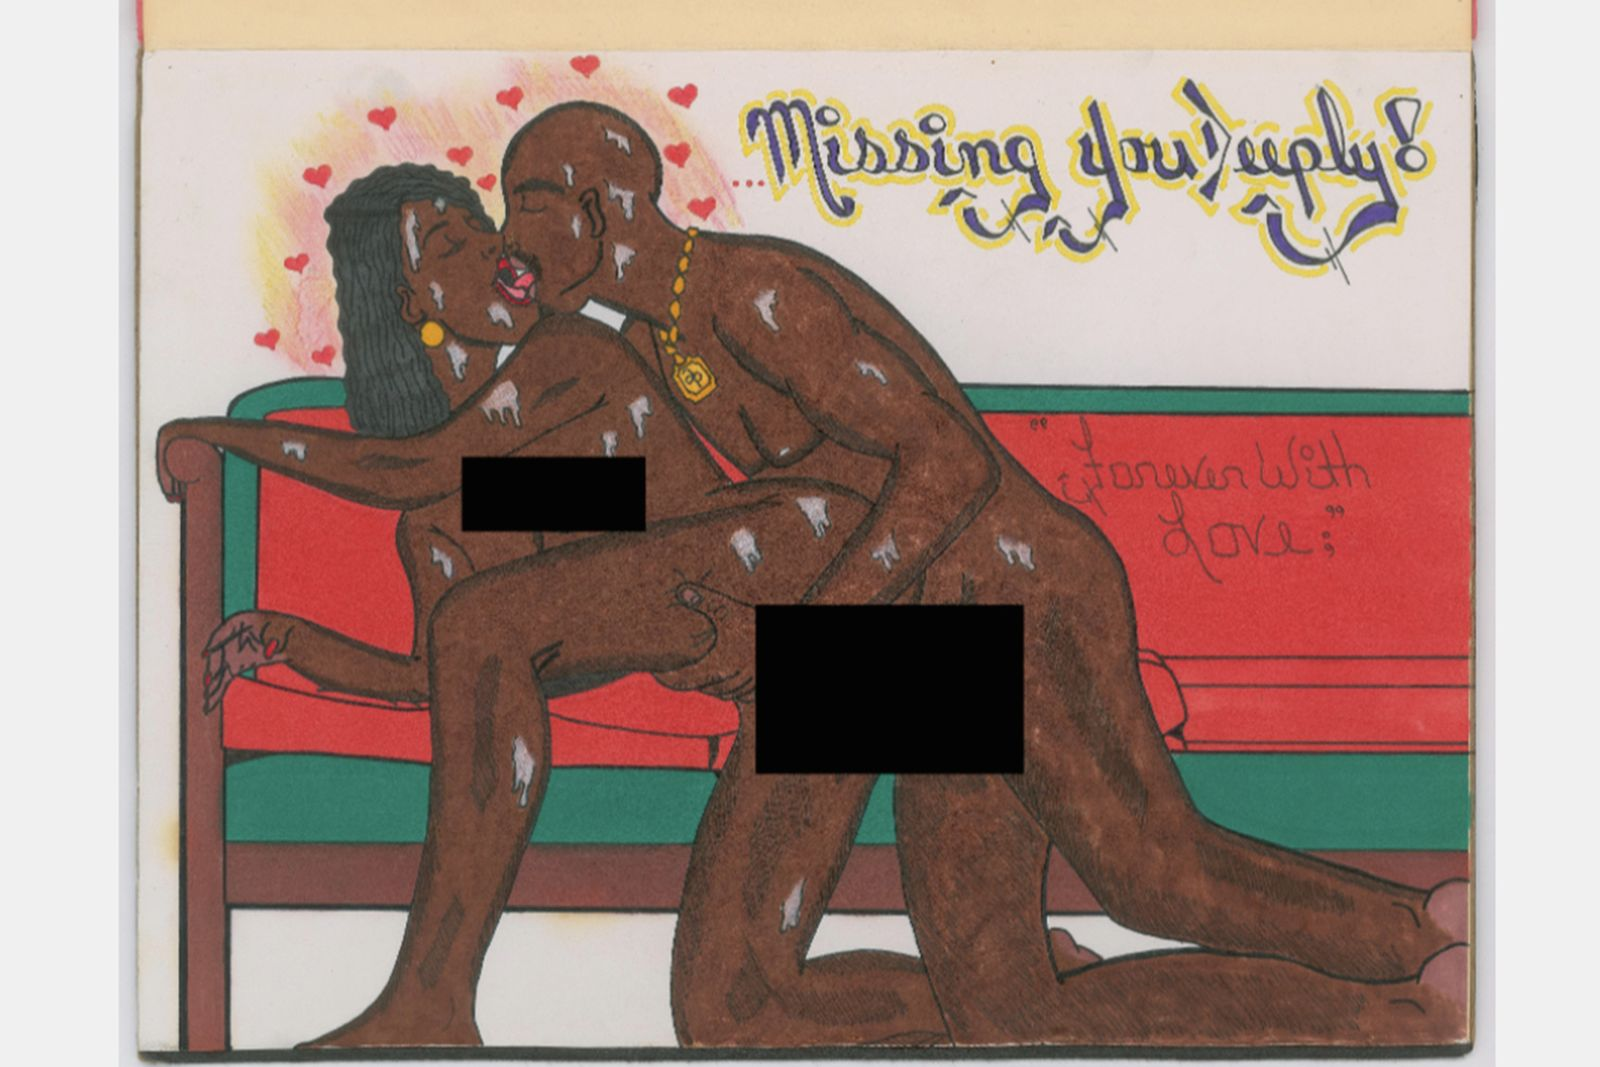 tupac shakur sex artwork auction